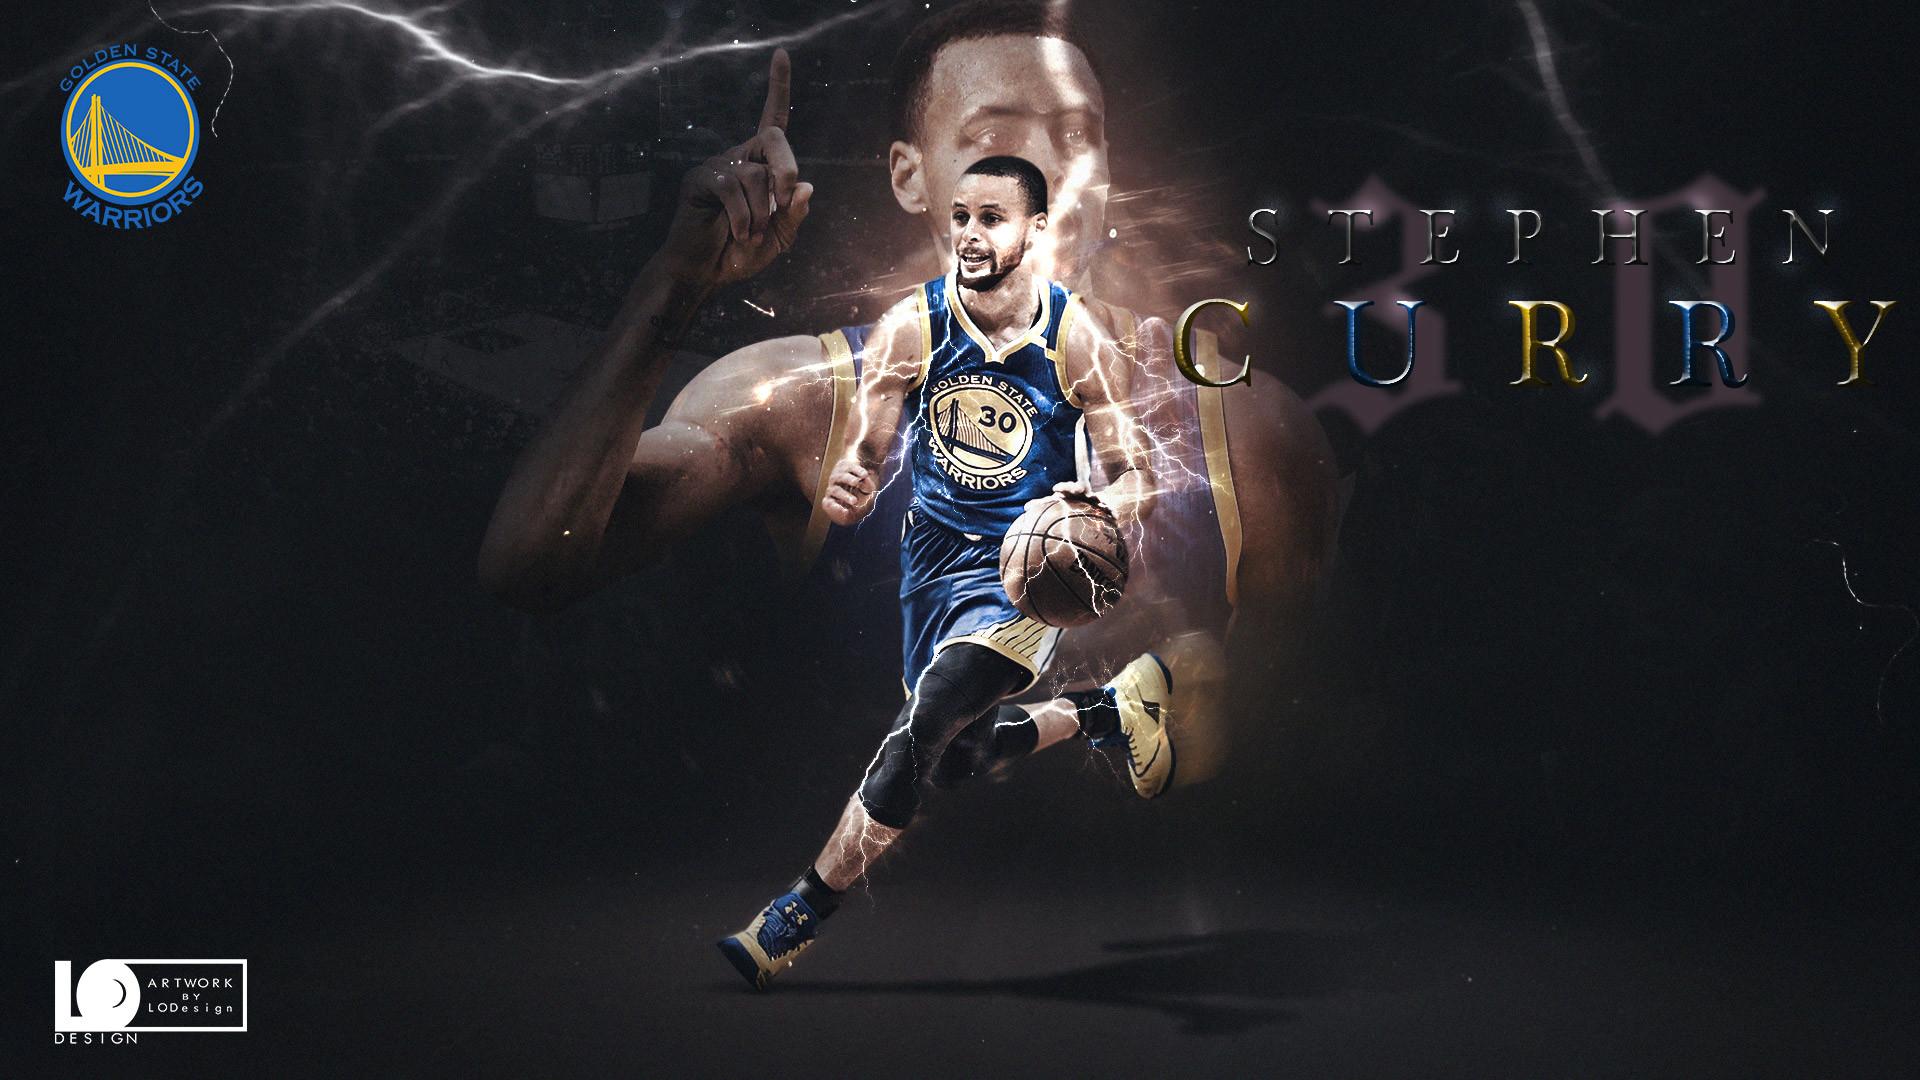 Stephen Curry 2017 Playoffs Wallpaper